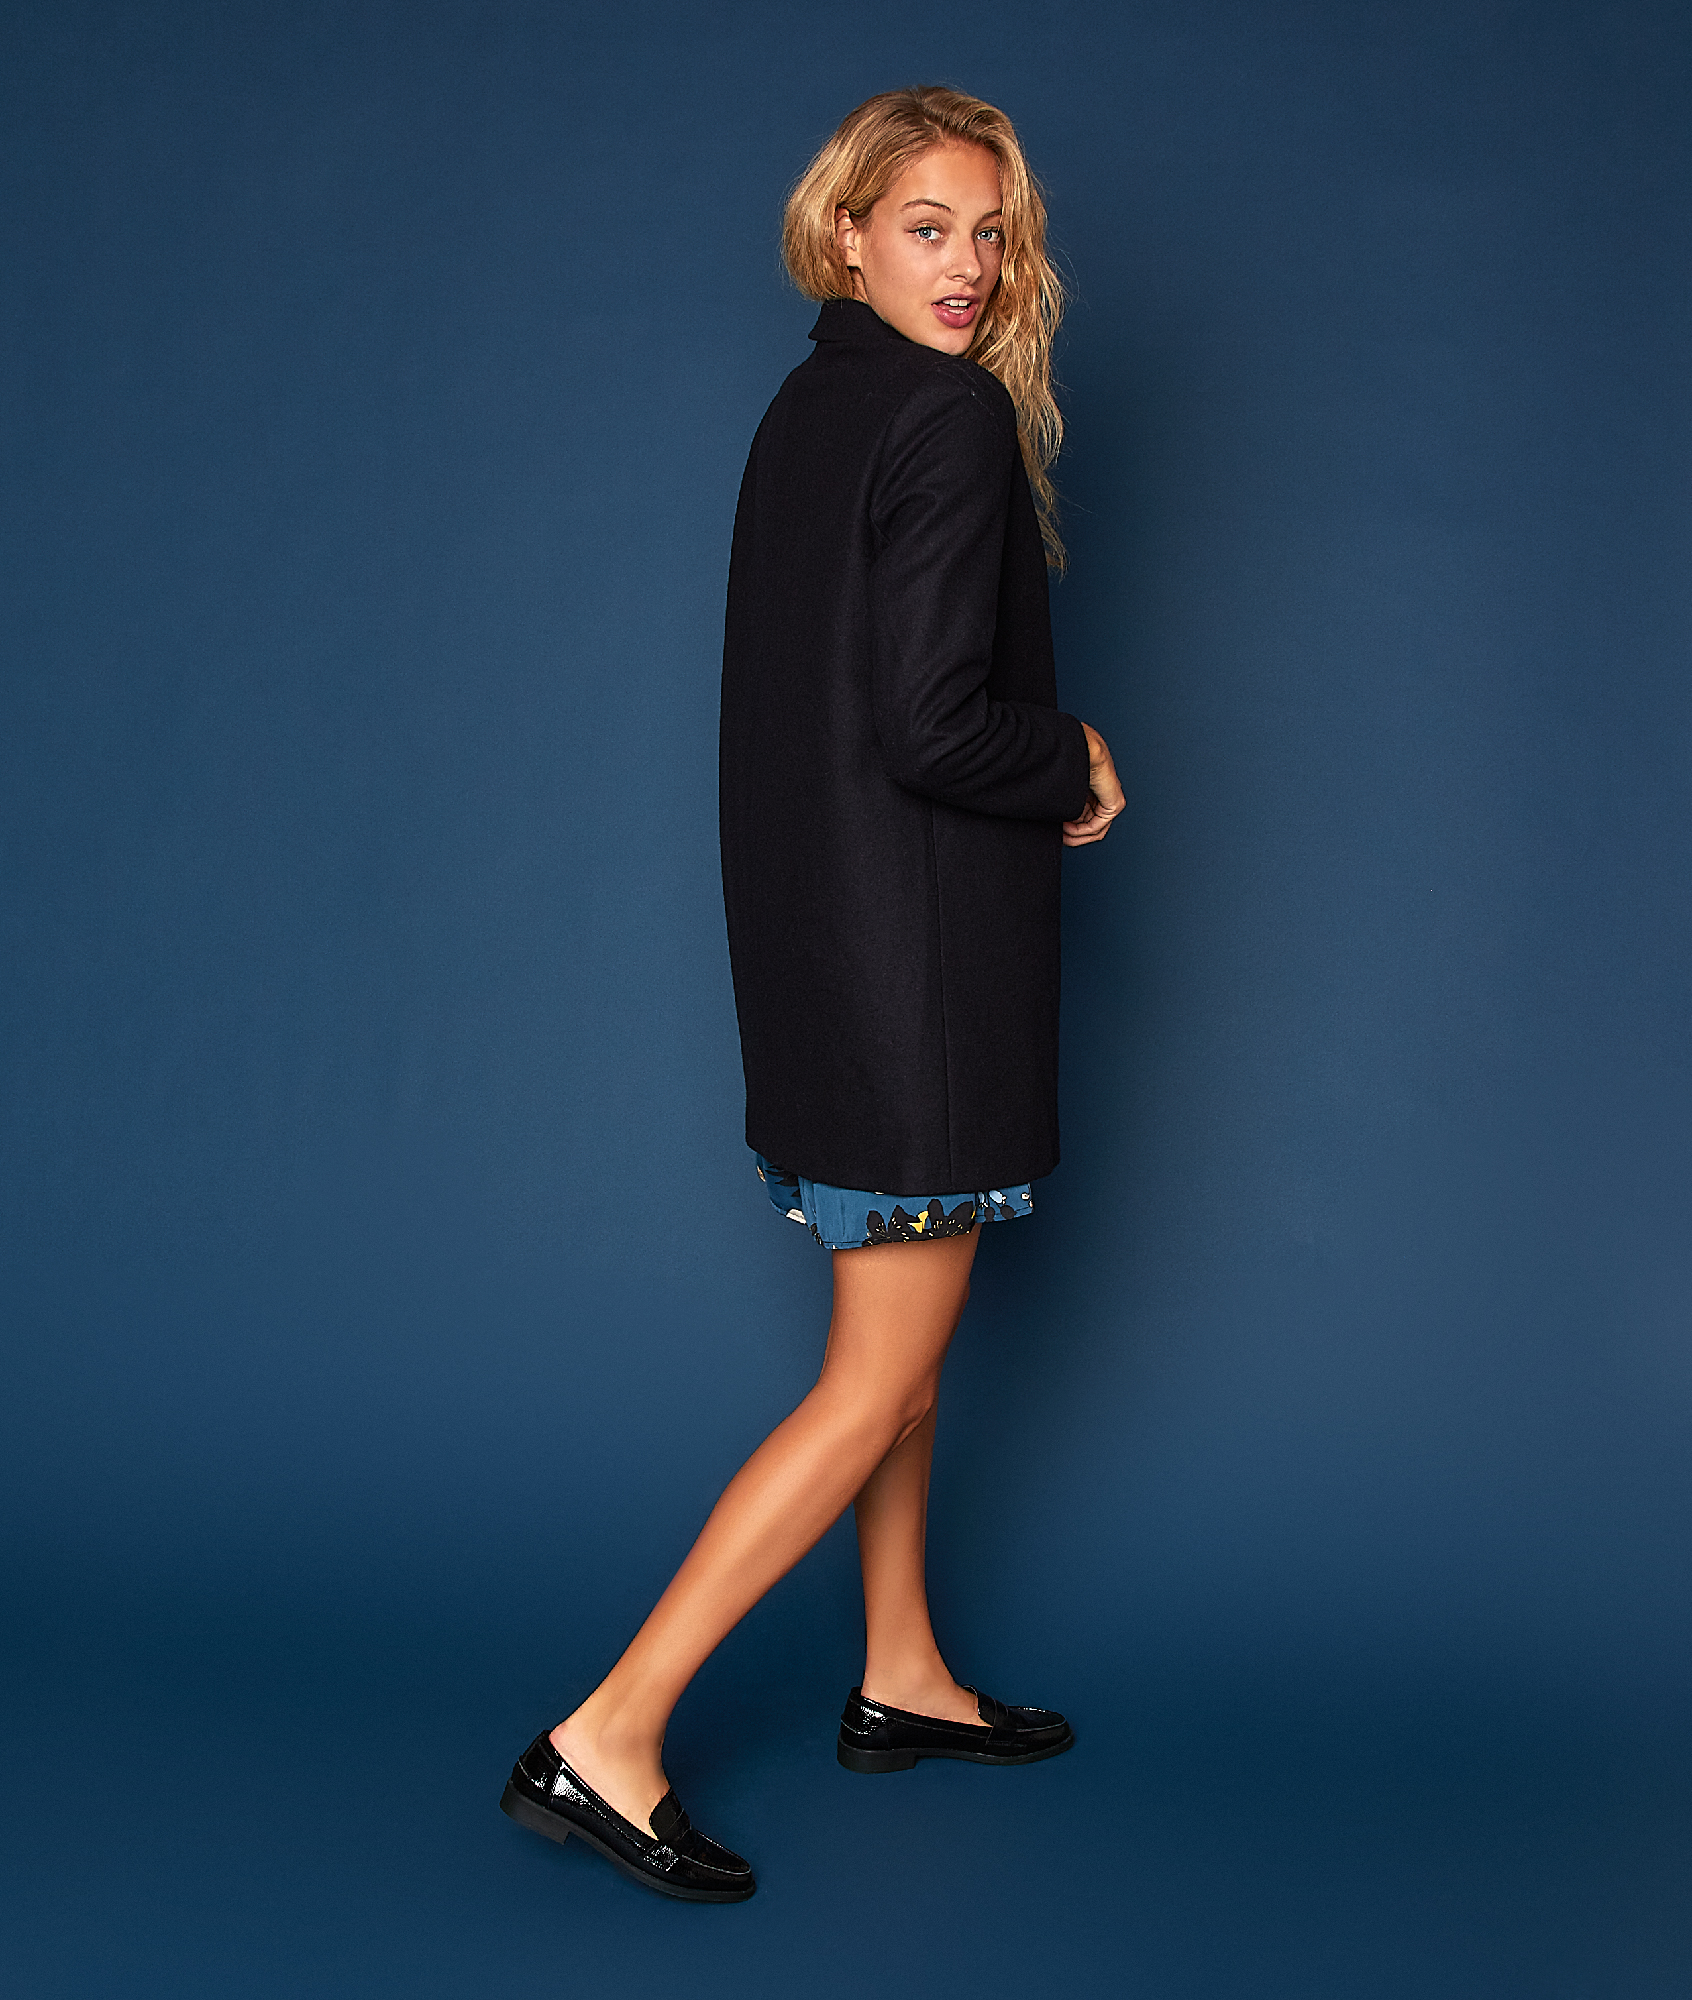 Manteau masculin 70% laine bleu marine.